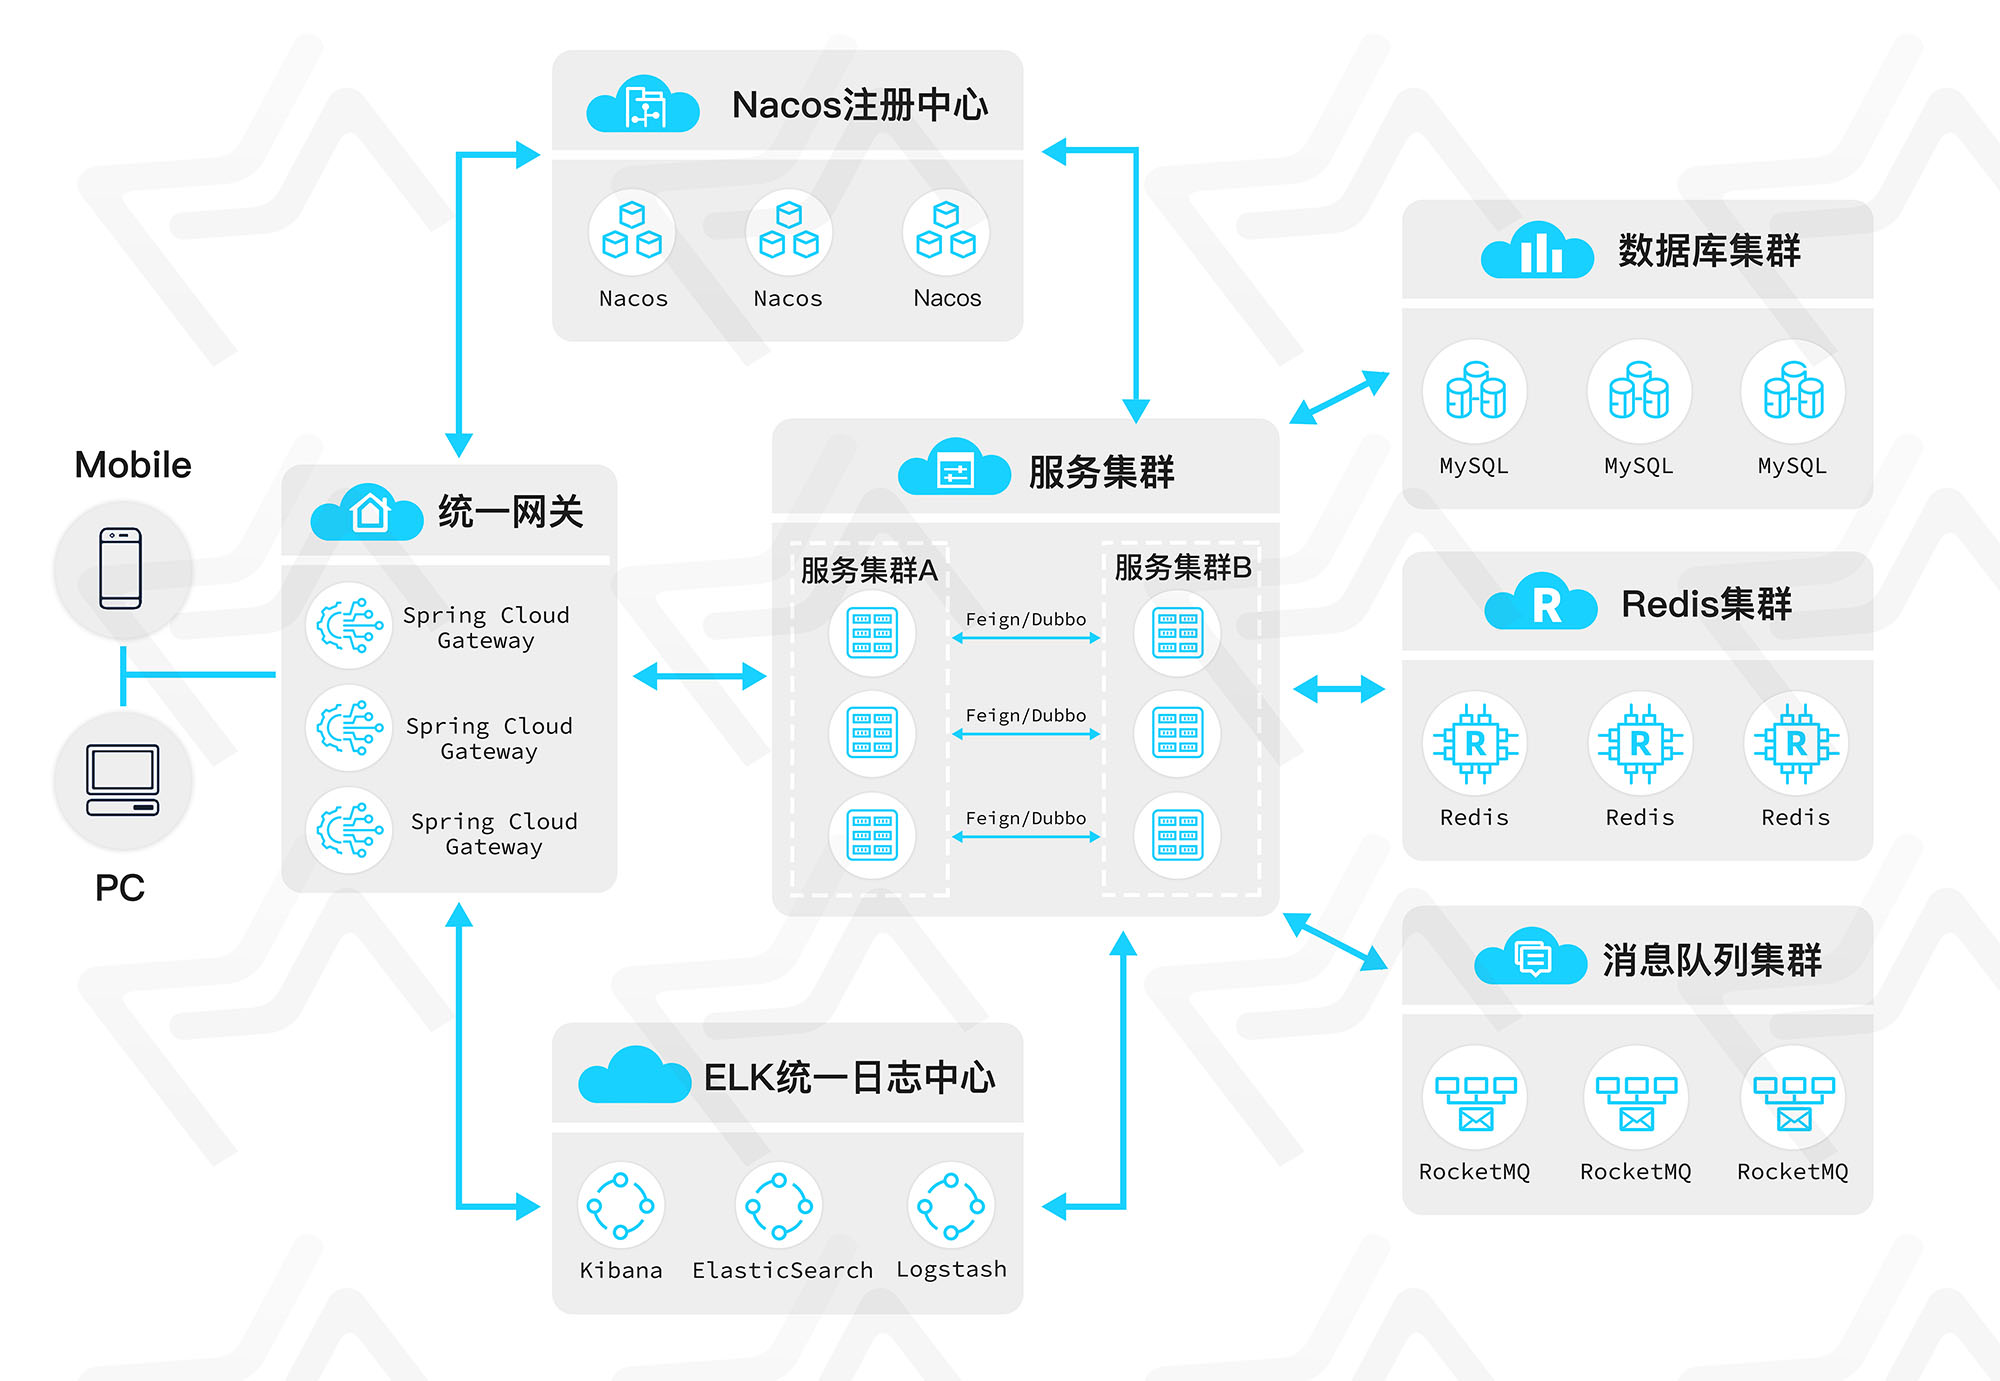 MateCloud 3.1.8 版本发布,基于 Spring Cloud Alibaba 的微服务平台